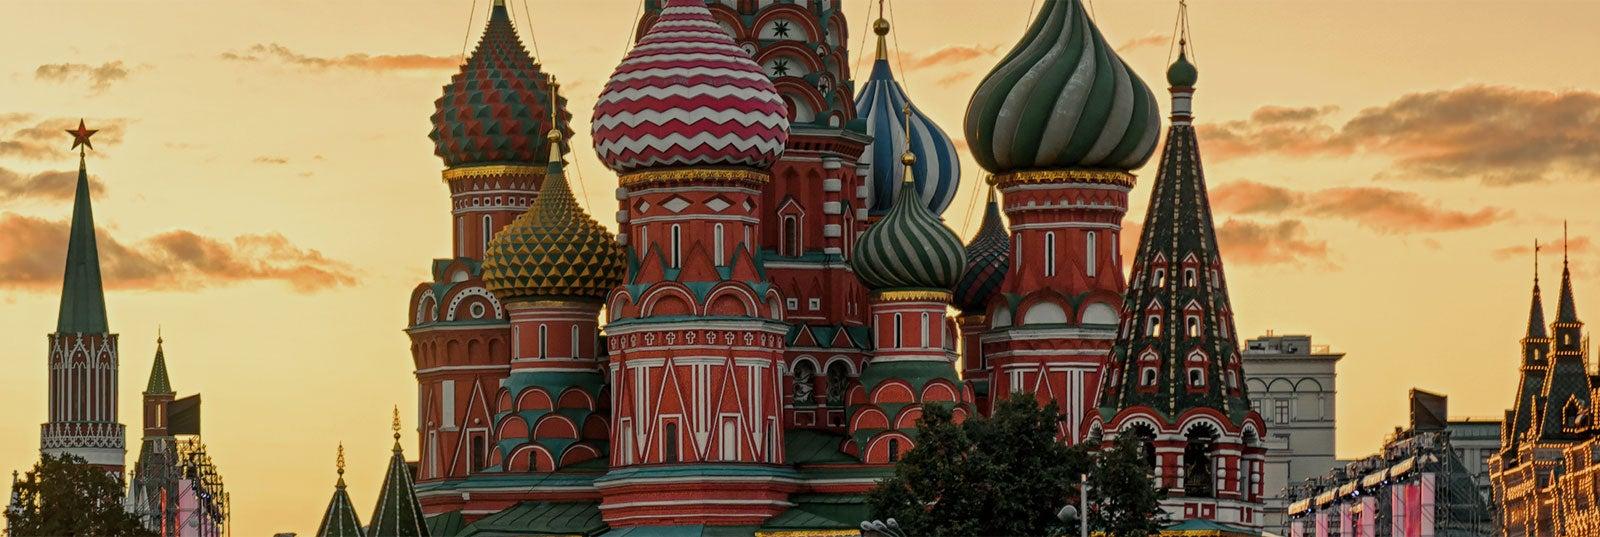 Guía turística de Mosca